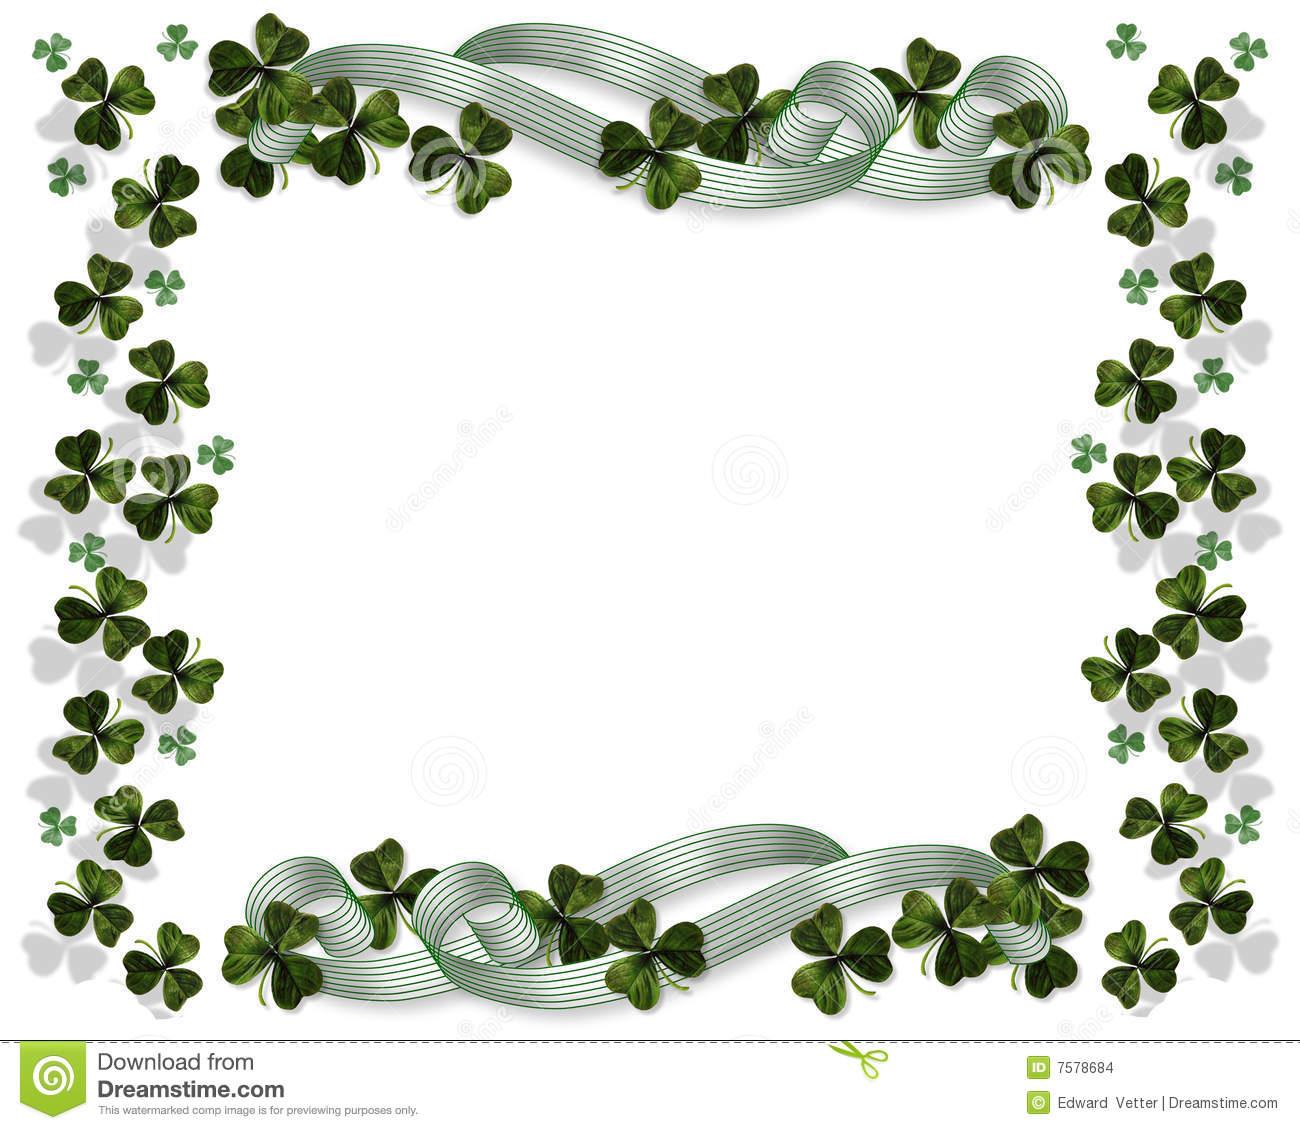 St Patricks Day Border stock illustration. Illustration of lucky.